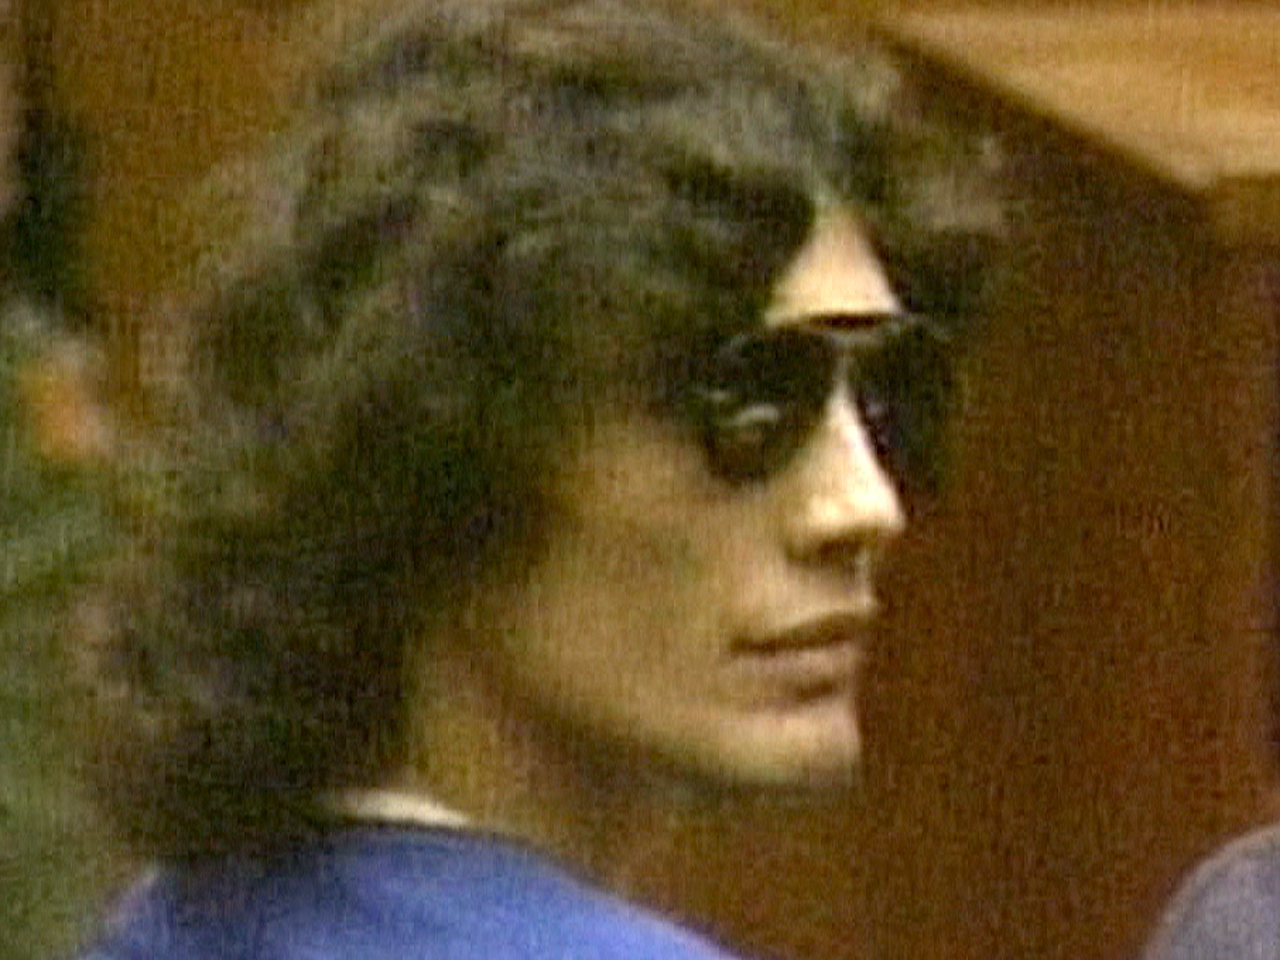 Night stalker' dies at 53 - Video on NBCNews com